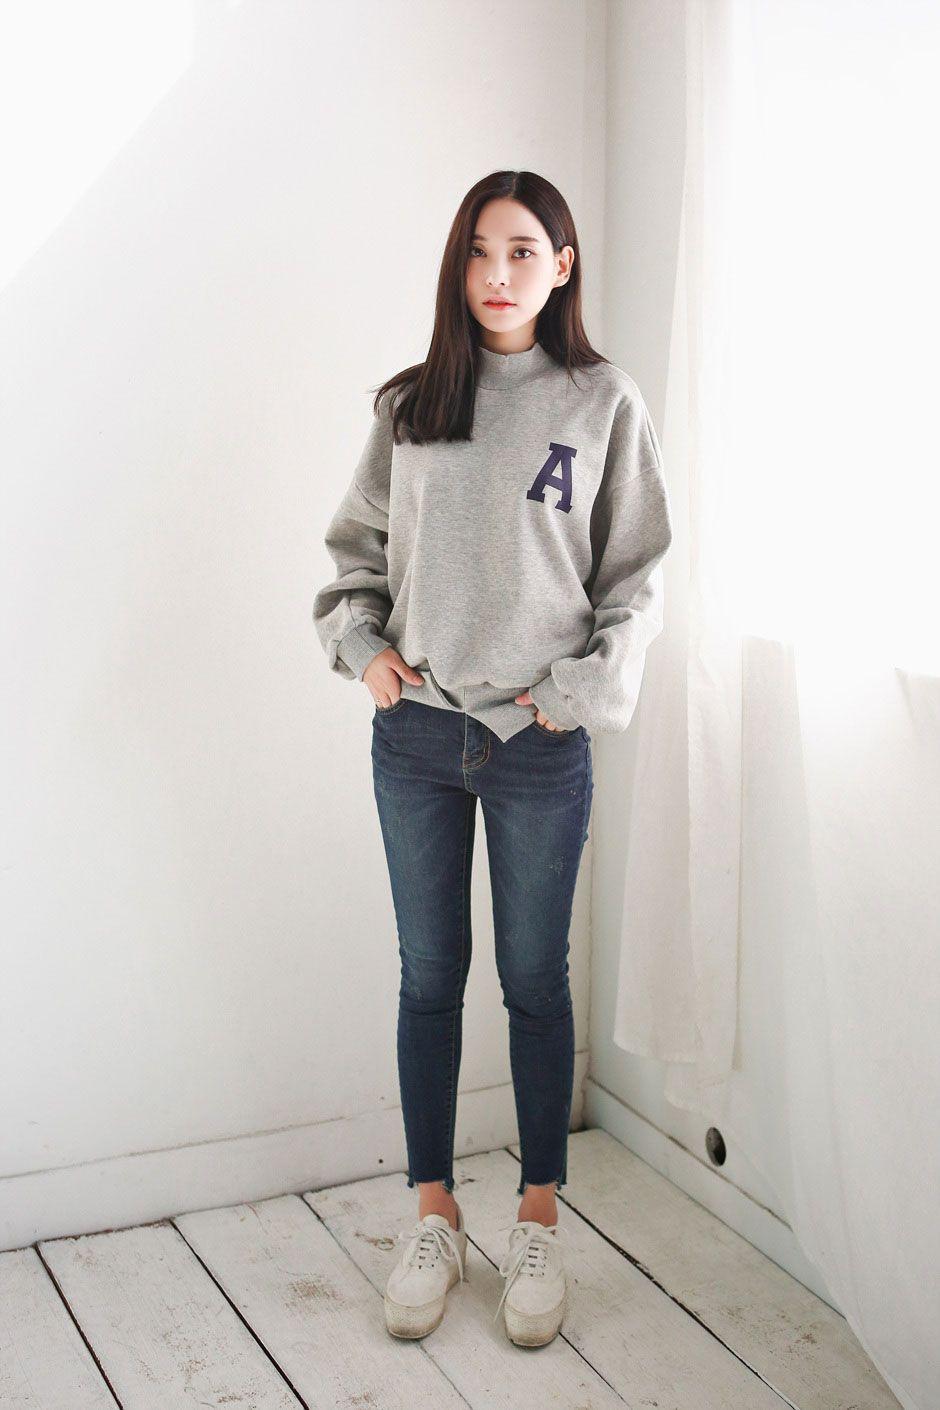 Pin By Korean Fashion On Korean Fashion Pinterest Korean Fashion Korean And Clothes